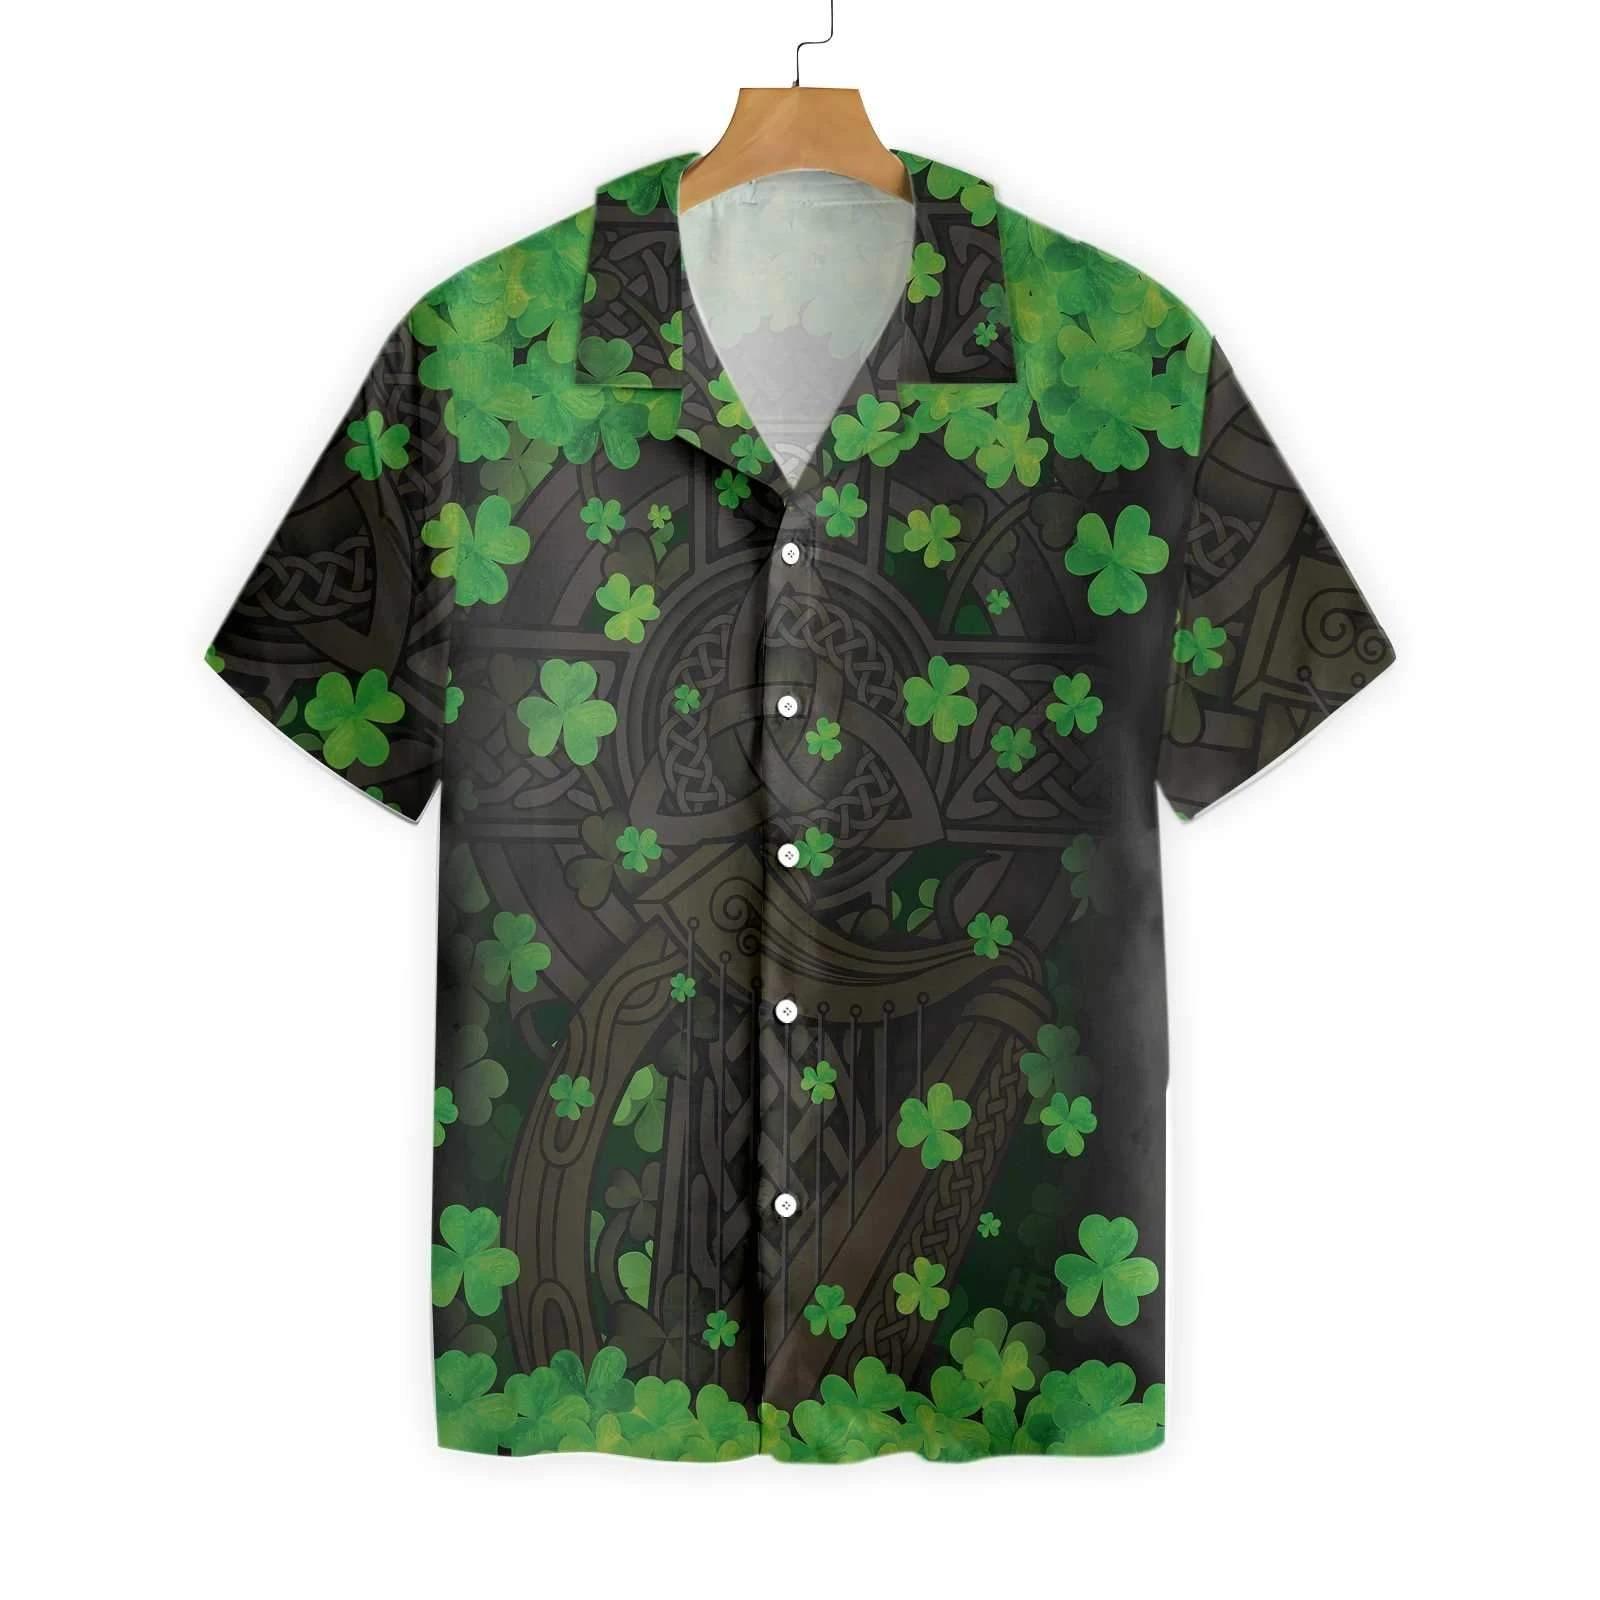 The Celtic Cross Harp Irish Hawaiian shirt